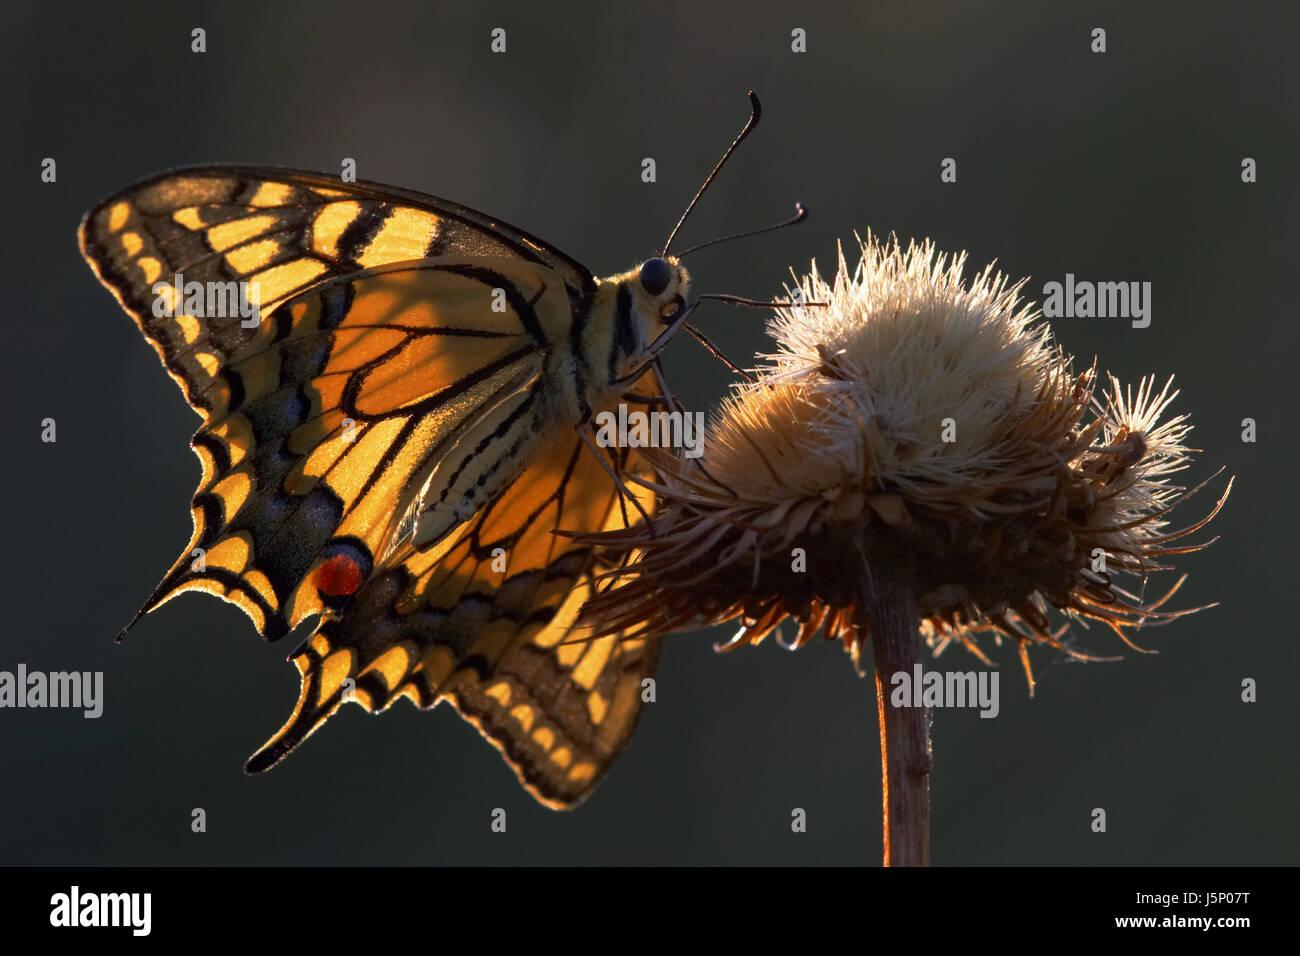 dovetail backlit - Stock Image